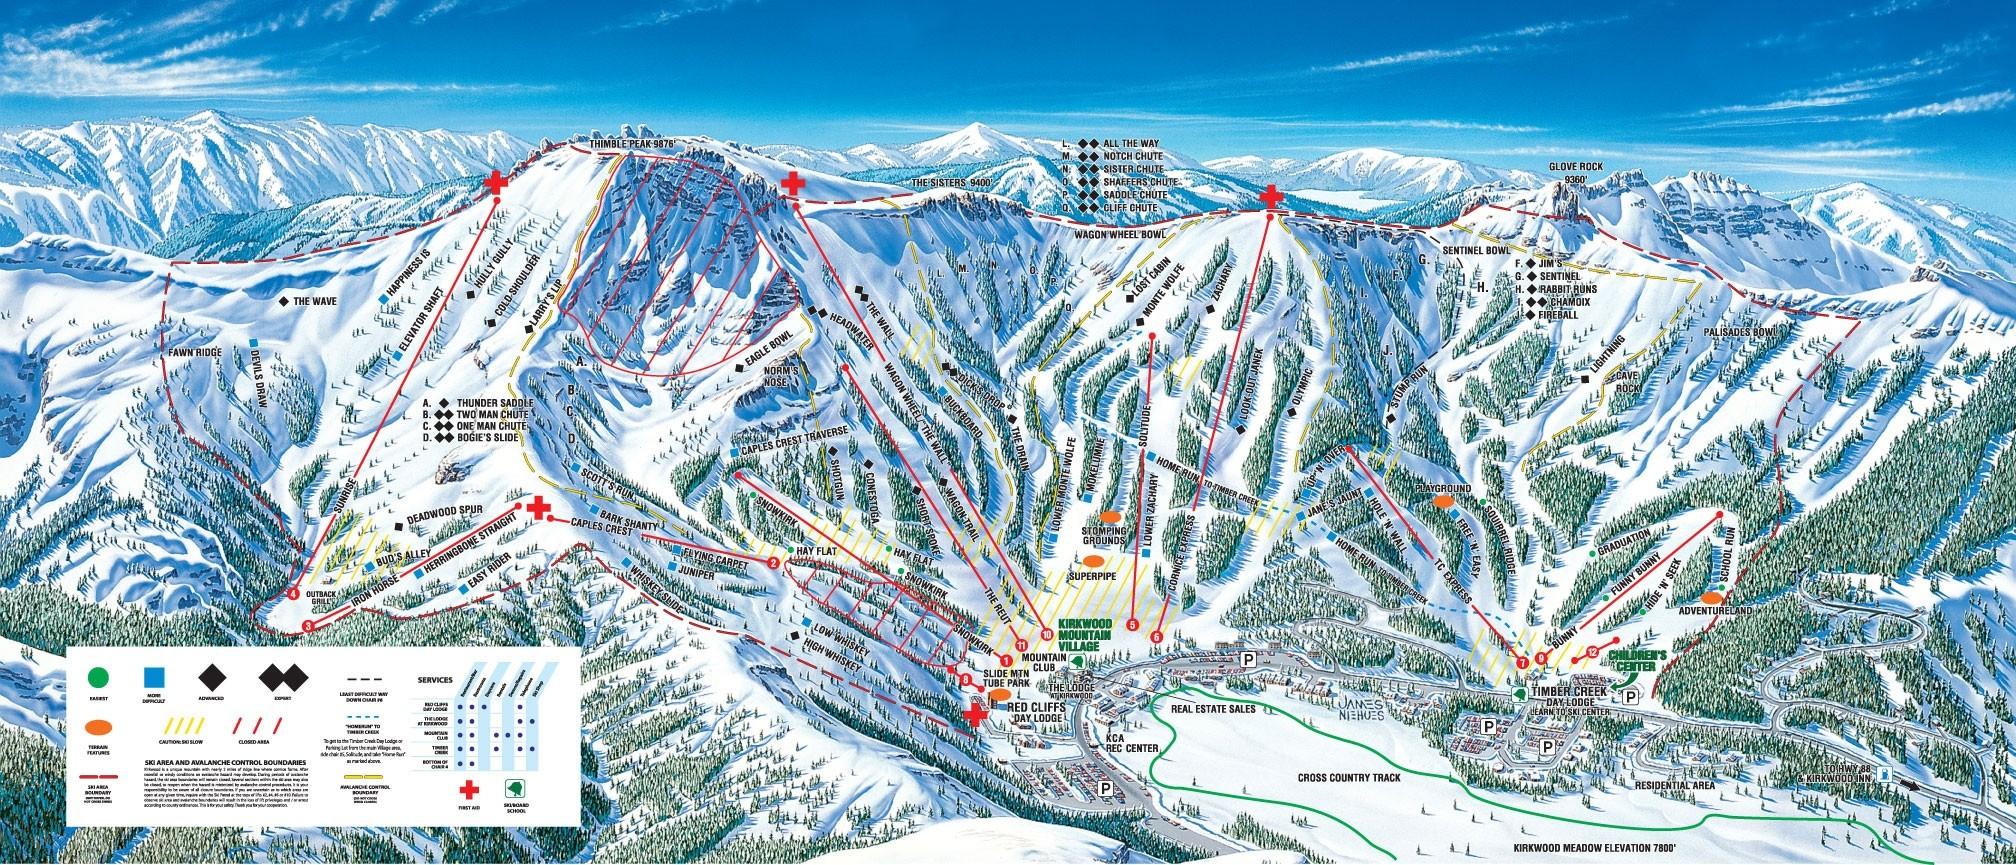 Kirkwood • Ski Holiday • Reviews • Skiing - Kirkwood California Map